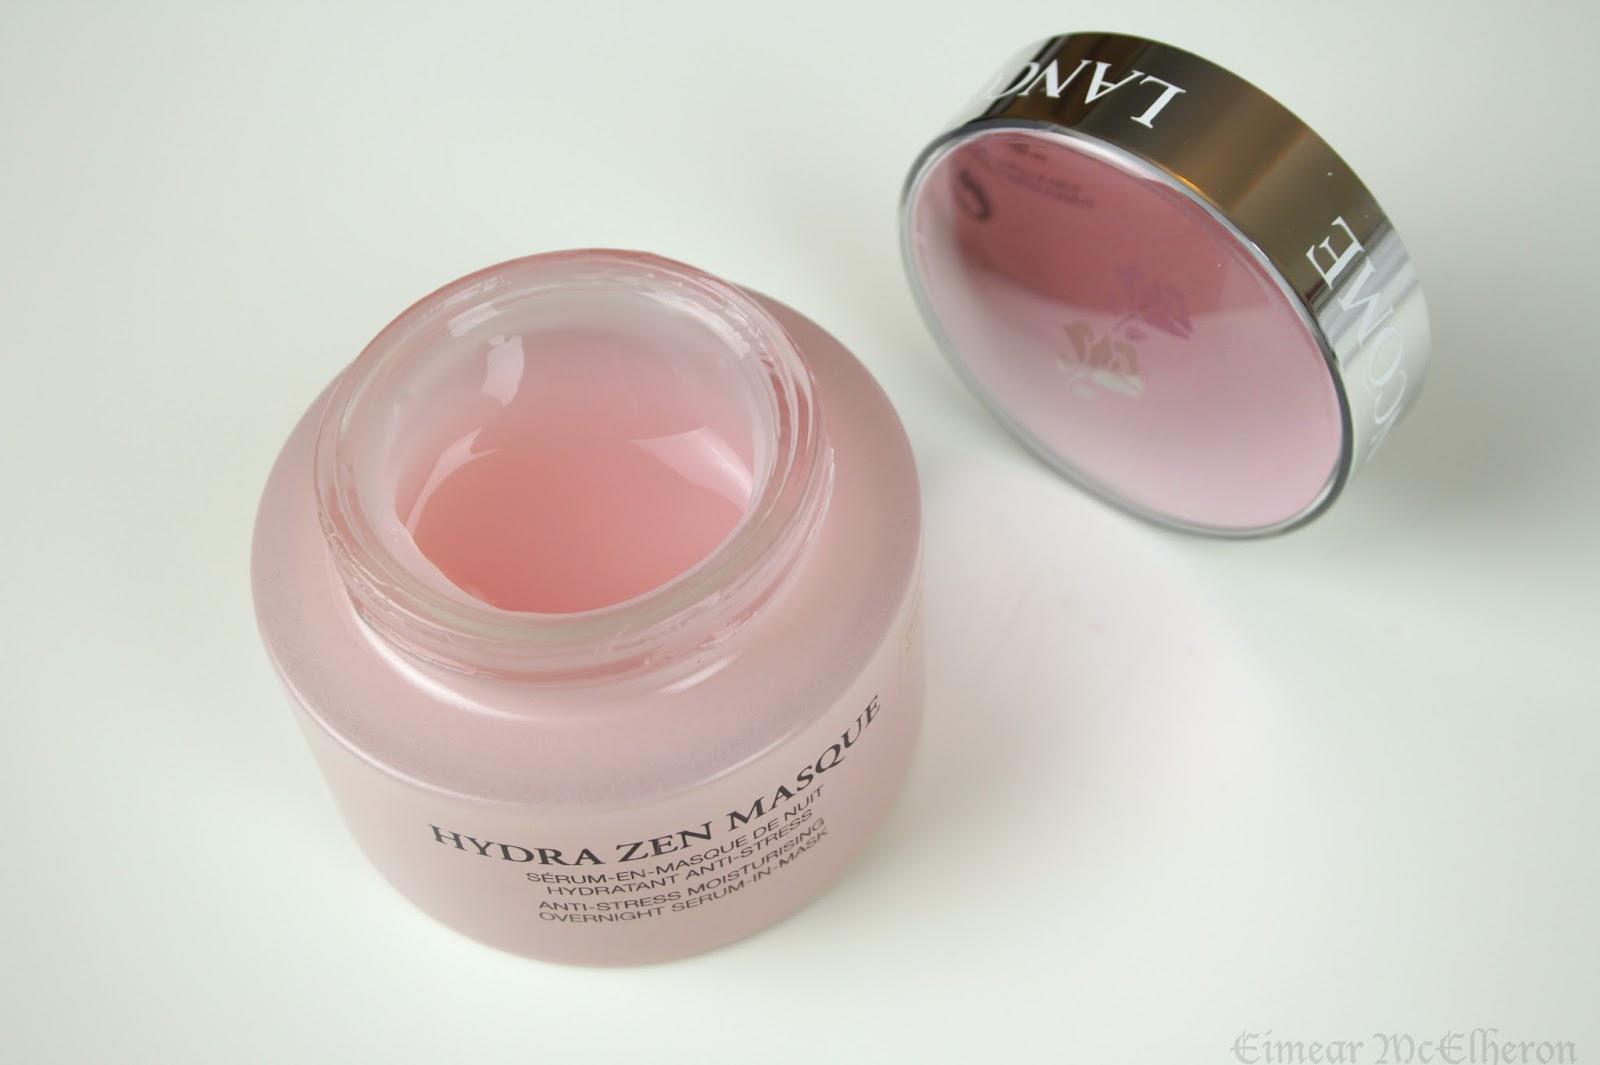 Lancome Hydra Zen Masque Anti Stress Moisturising Overnight Serum Lancme Cream Gel 50ml Guinot Rich Lift Firming 16oz